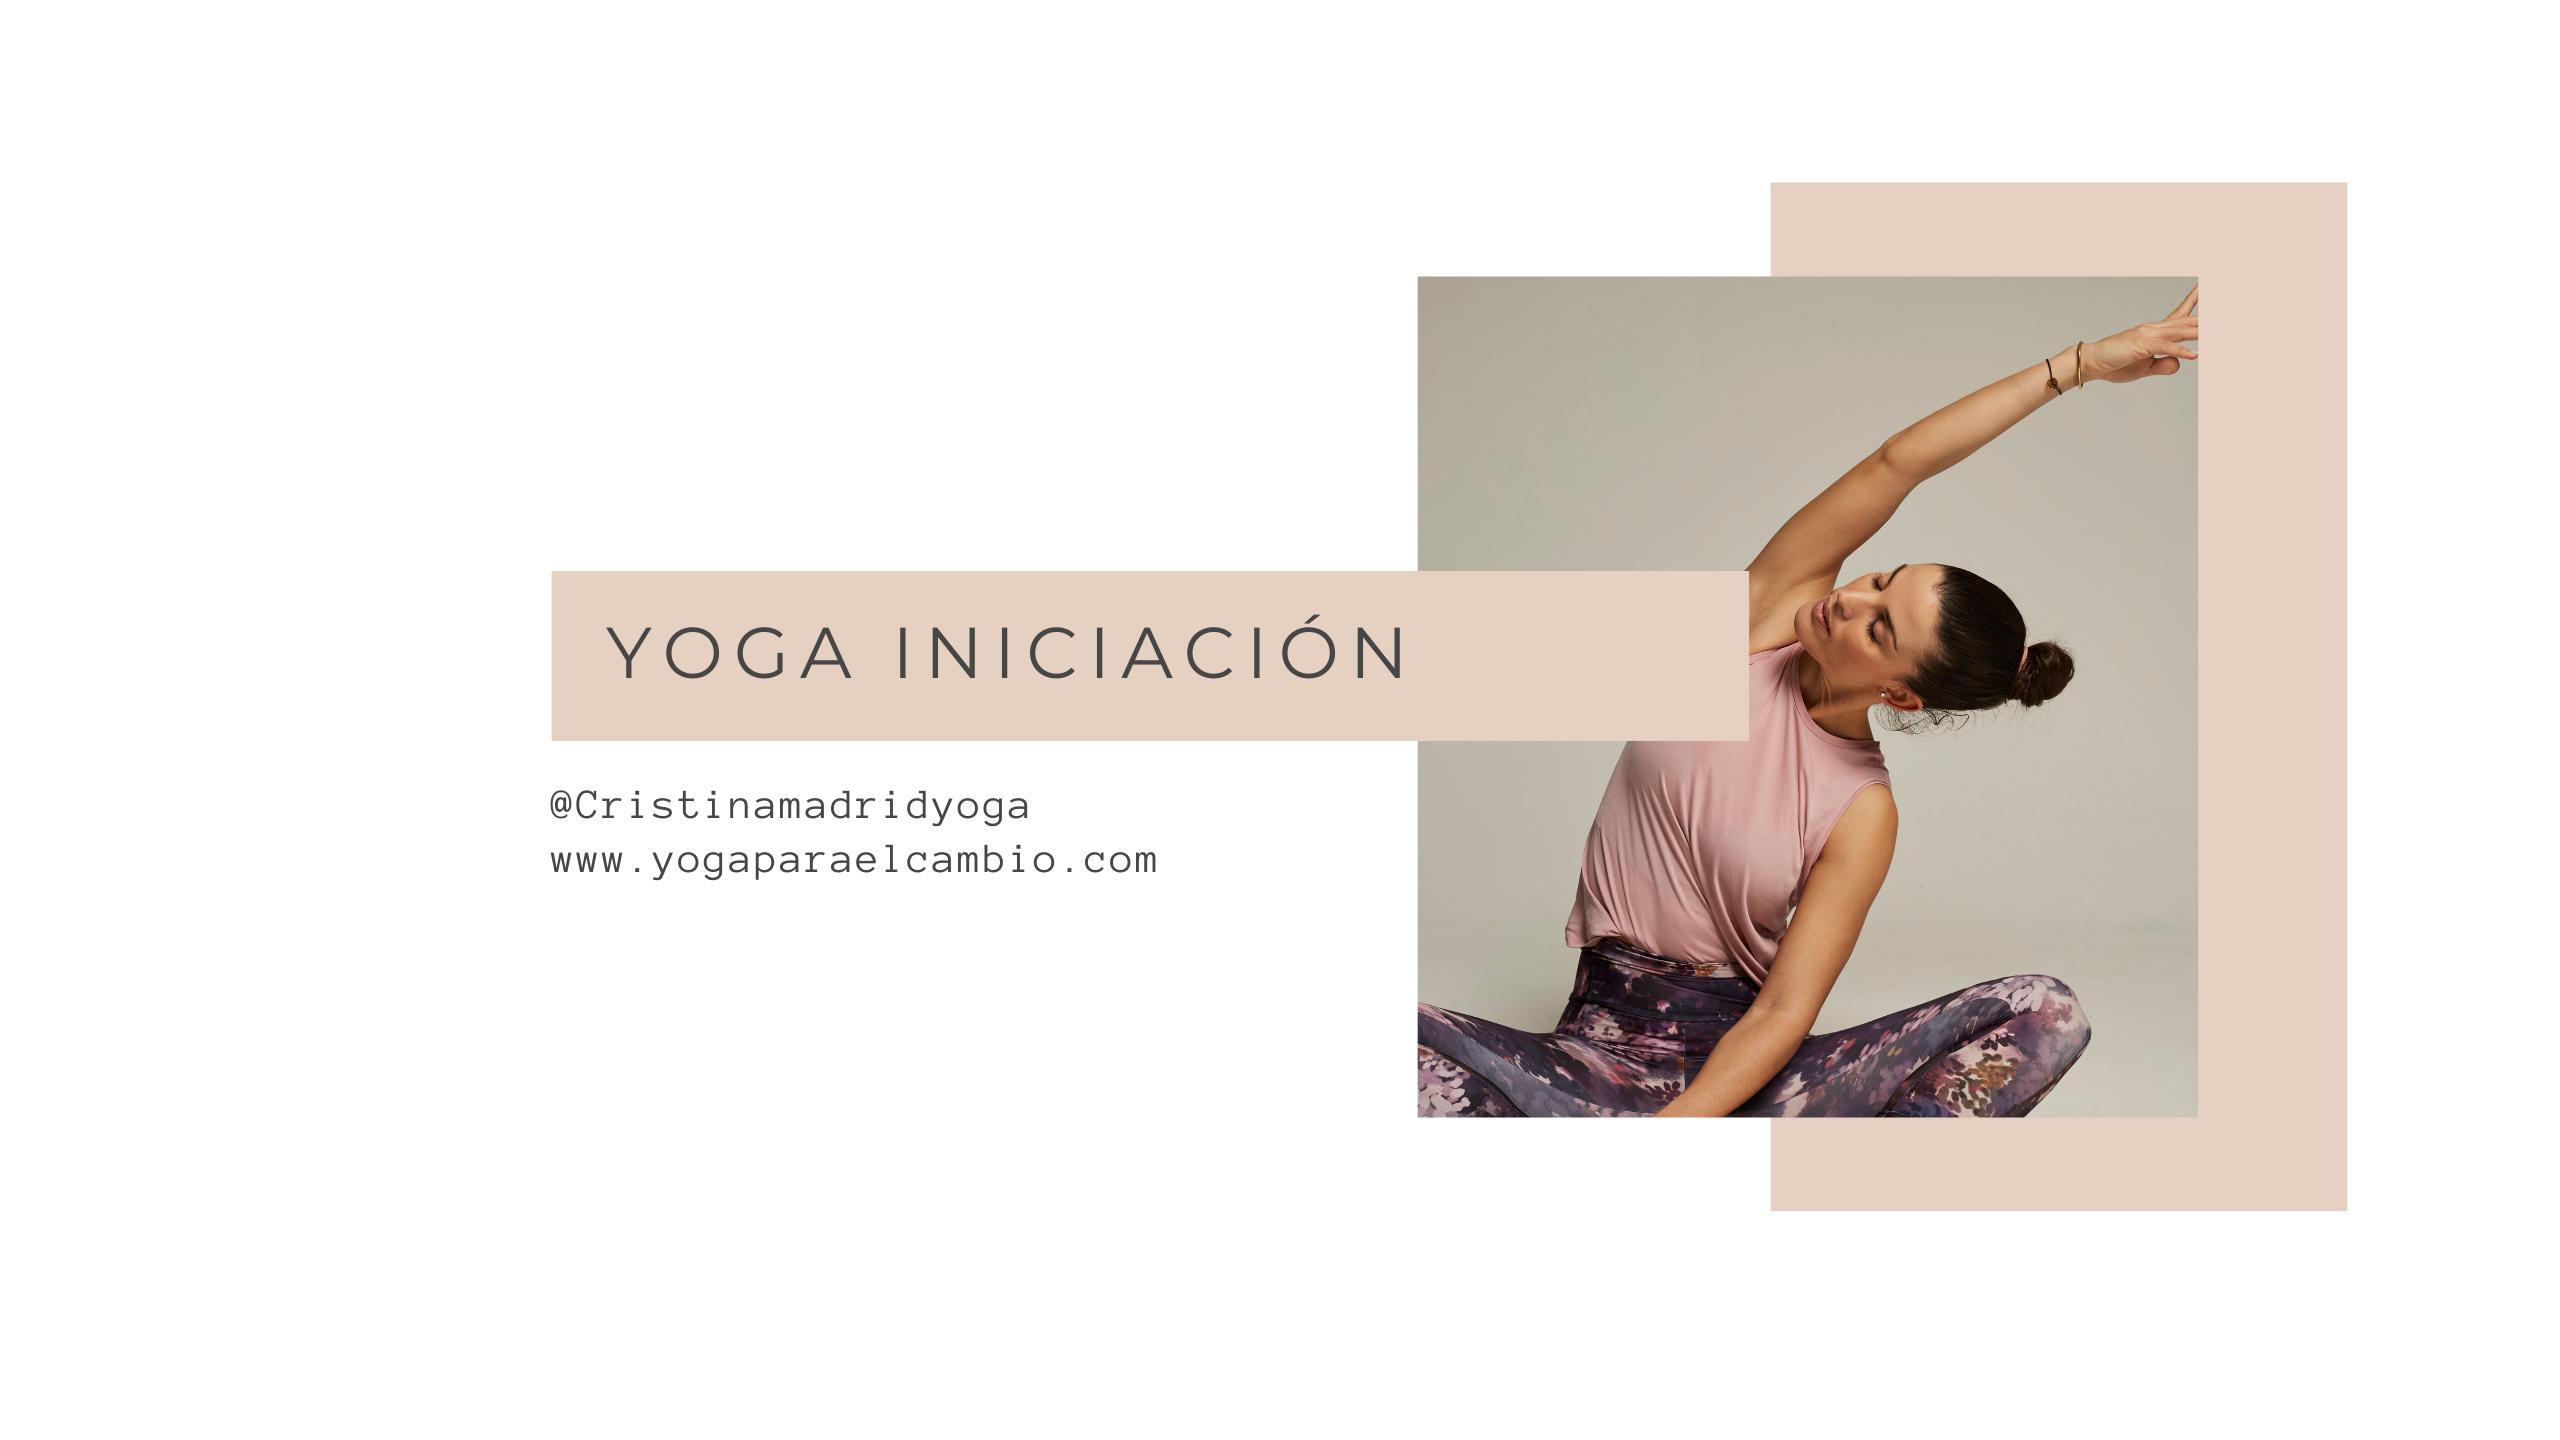 clase de yoga iniciación